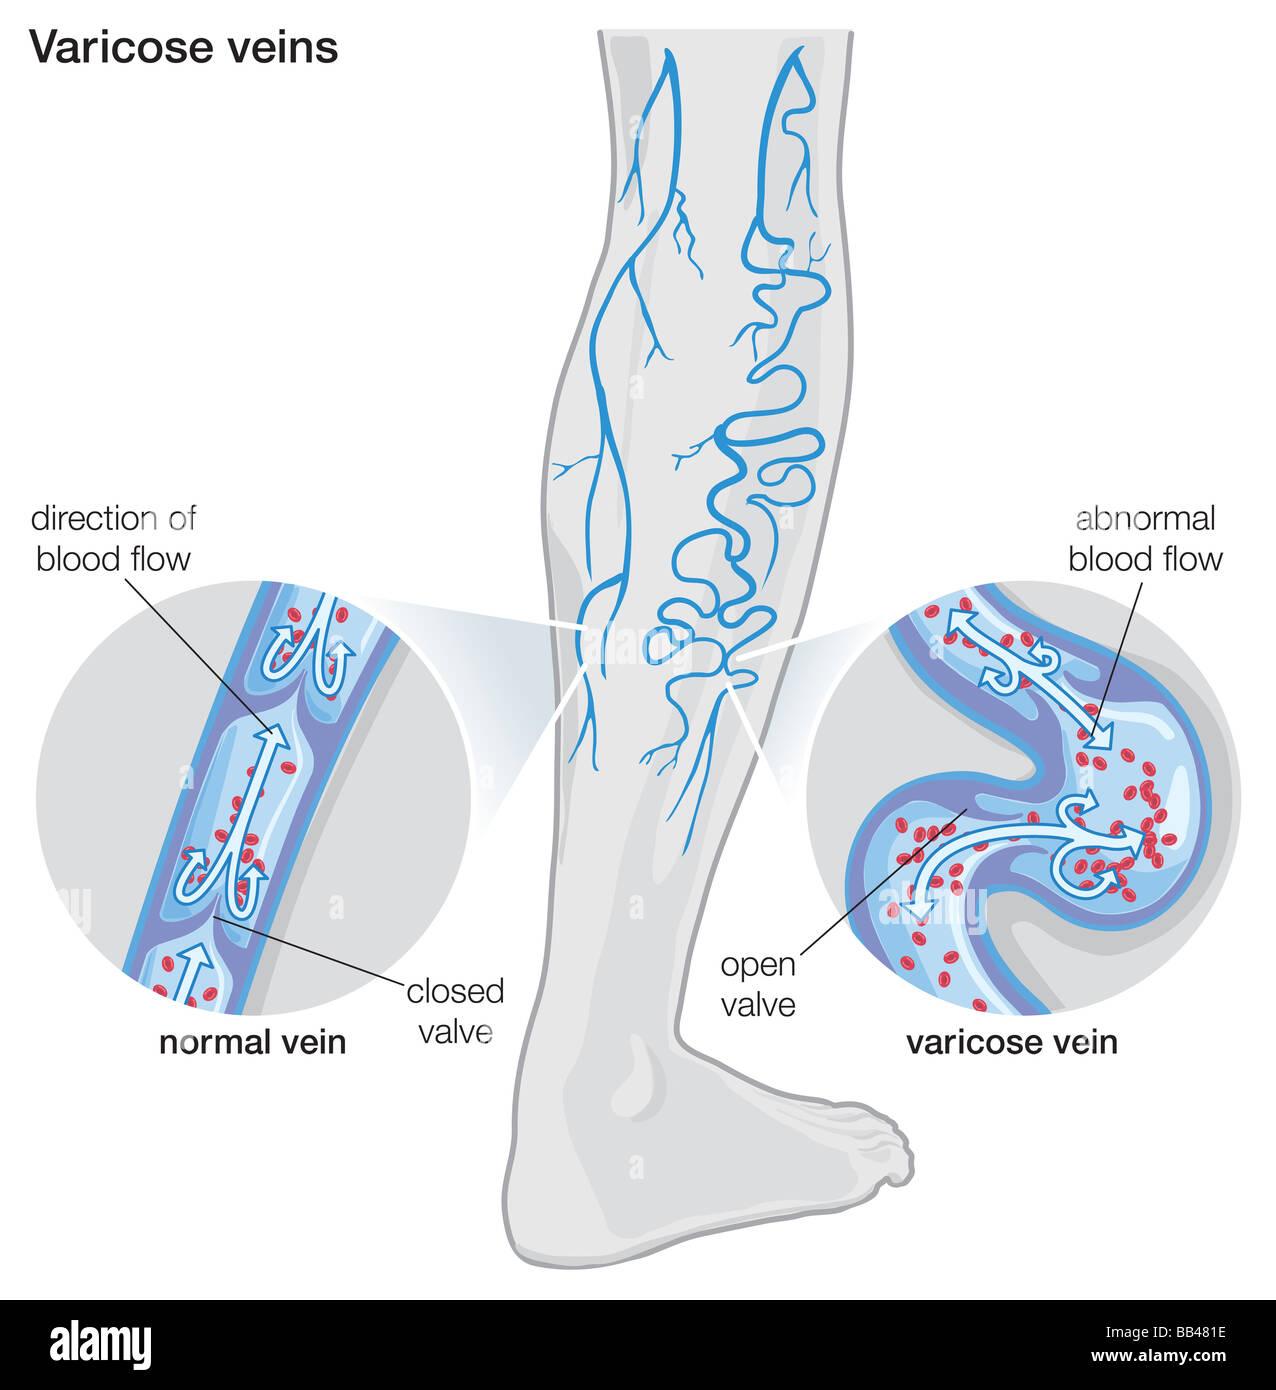 Veins Leg Biology Stockfotos & Veins Leg Biology Bilder - Alamy